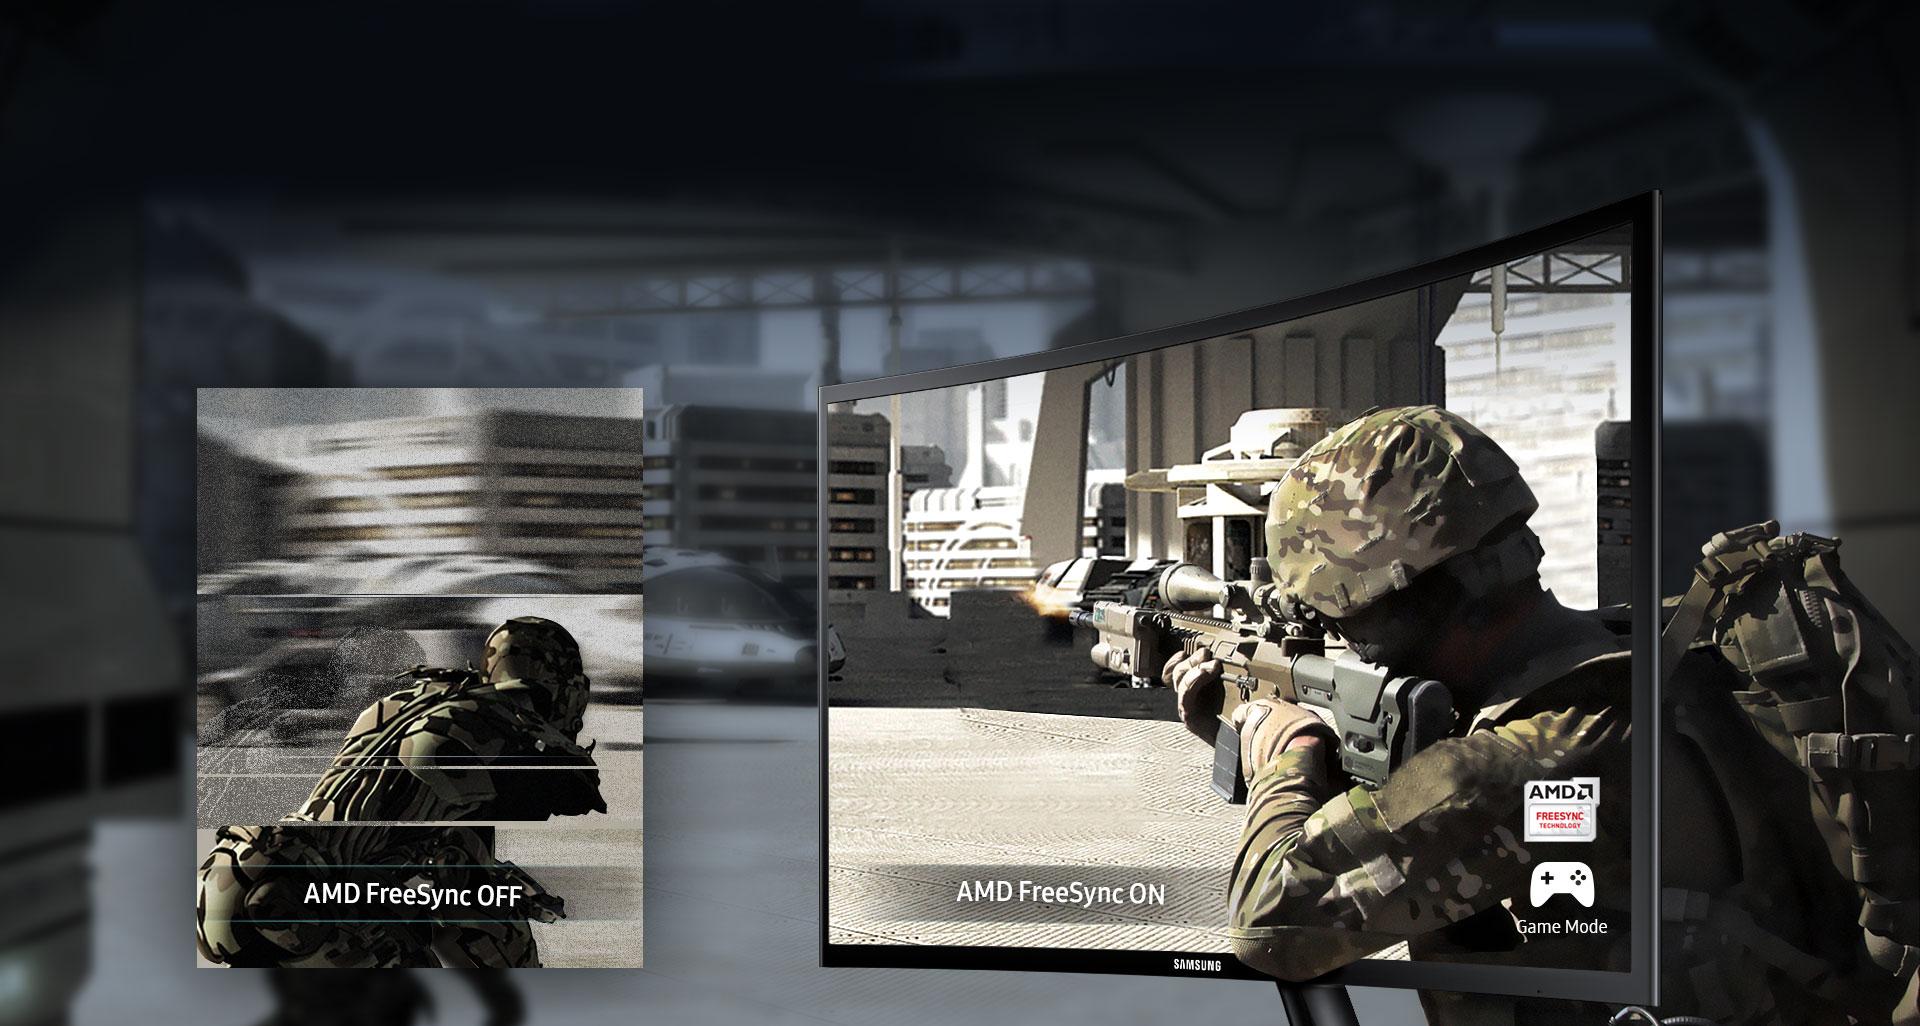 AMD FreeSync ile kusursuz oyun heyecaný